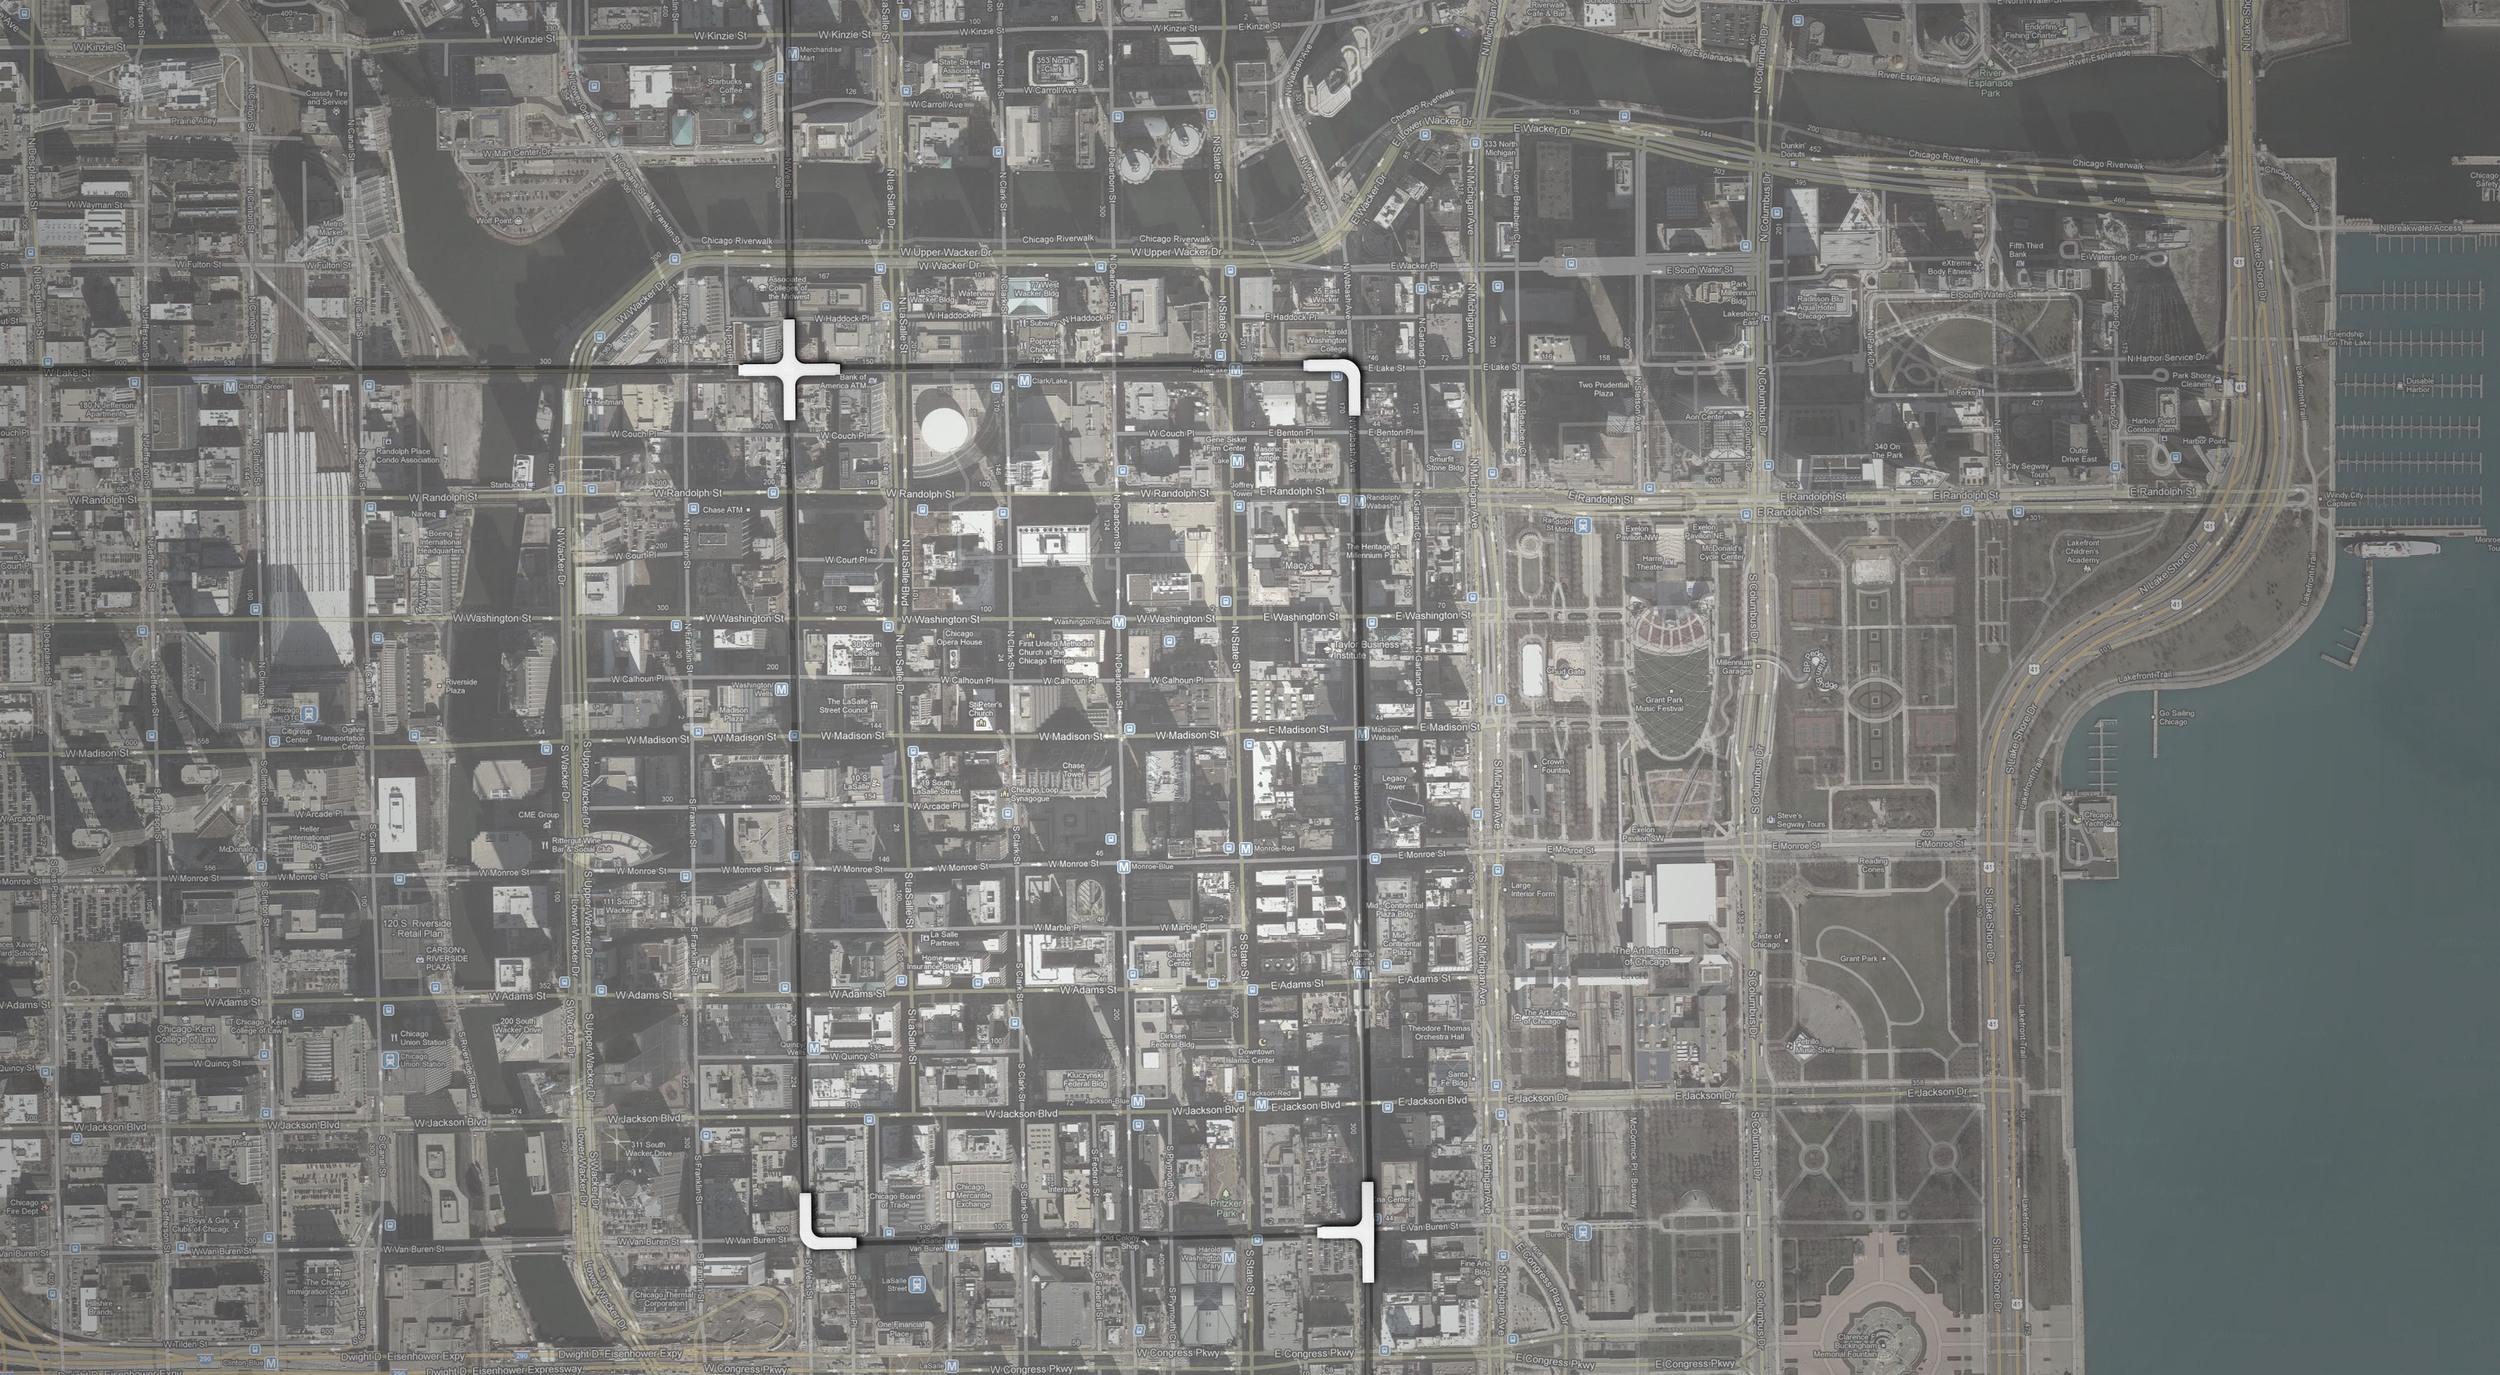 13_07.09 - overall-aerial.jpg